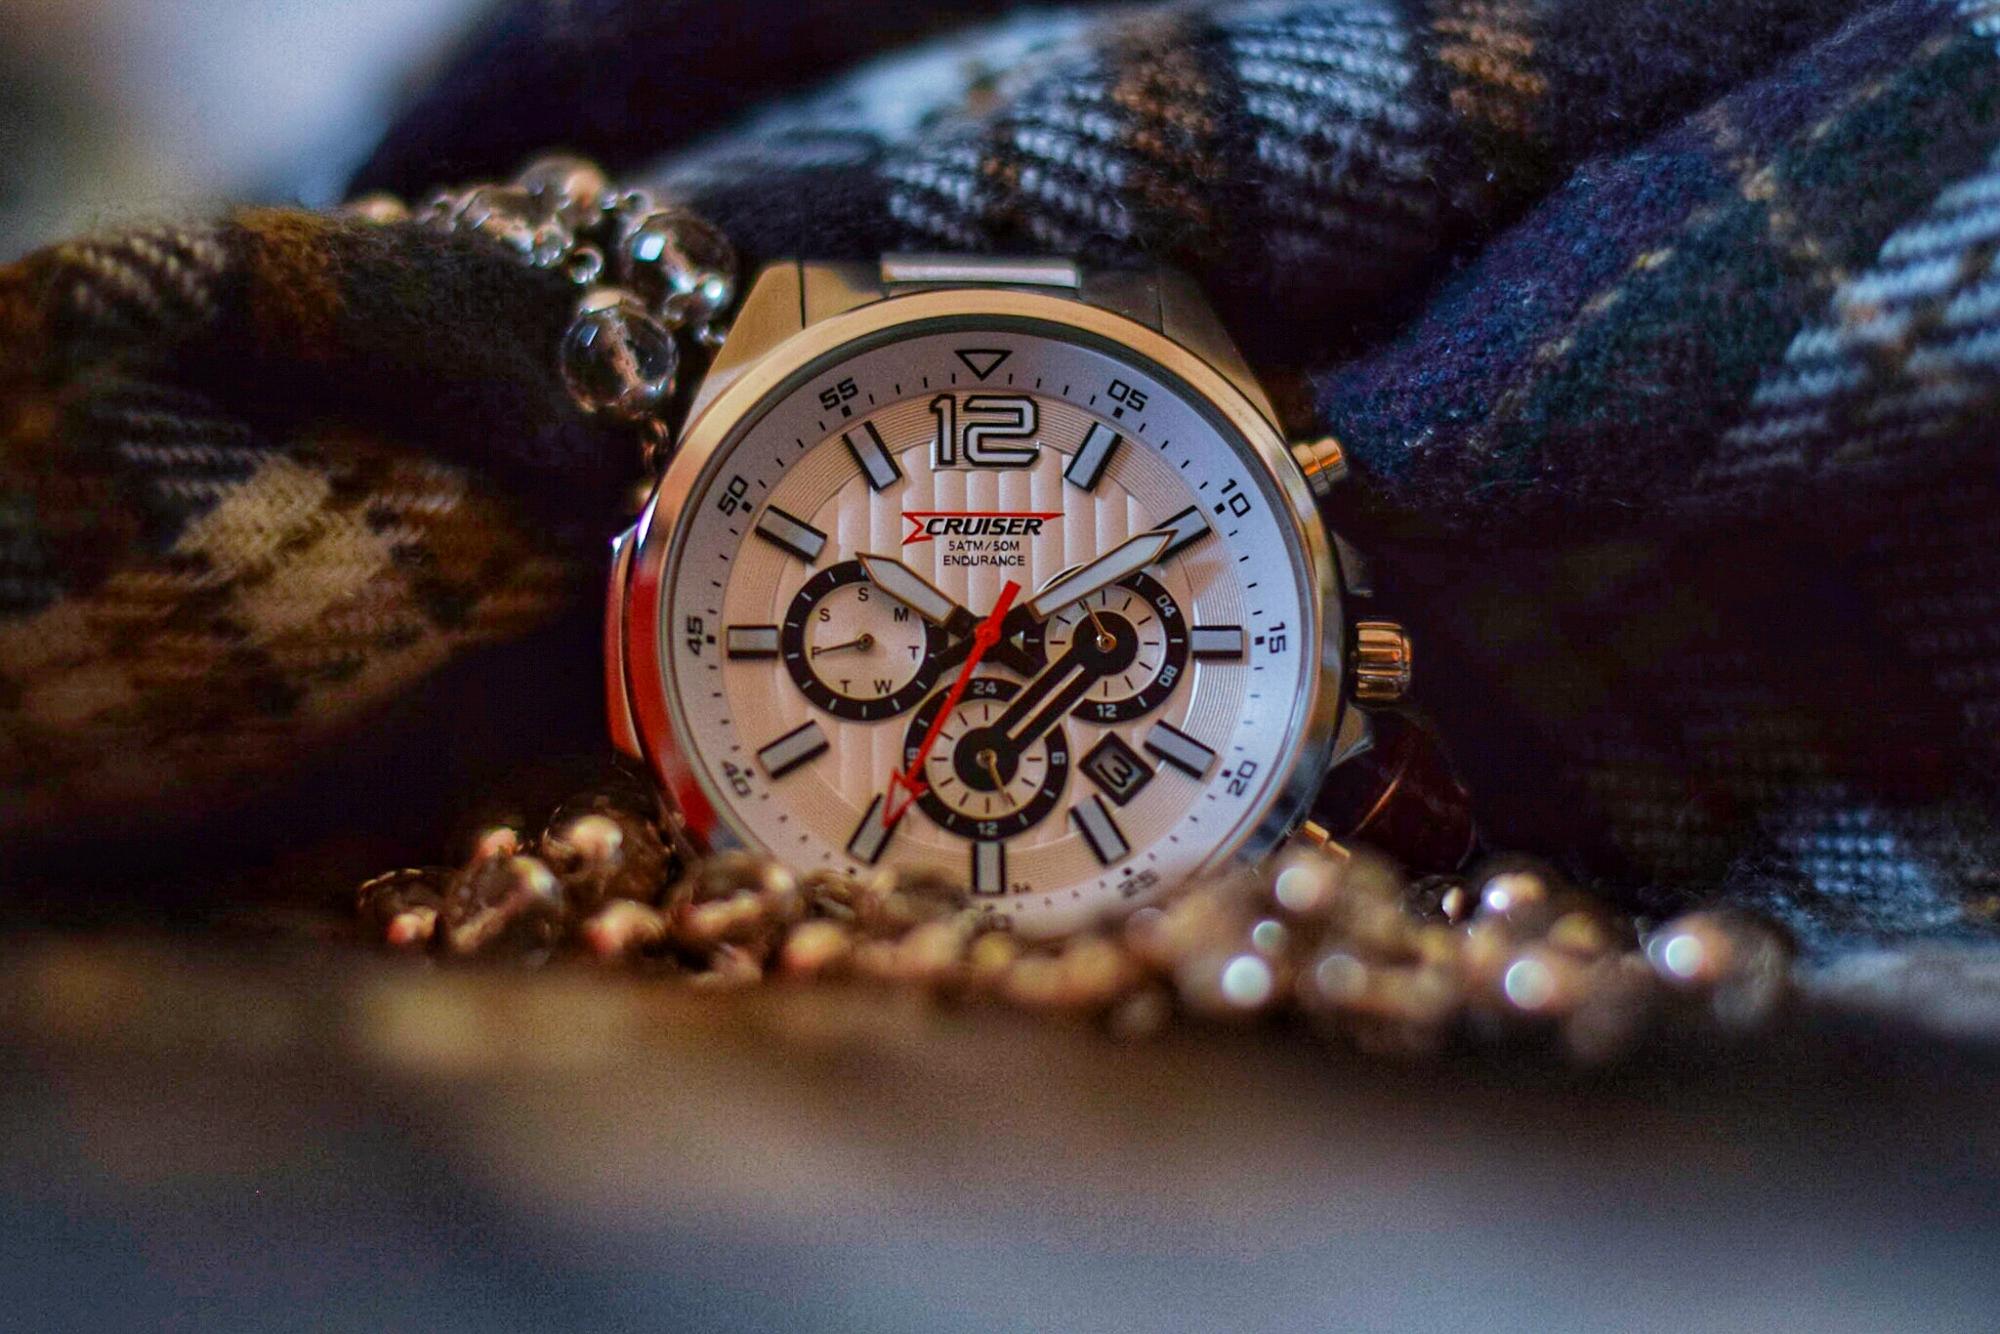 An expensive wristwatch